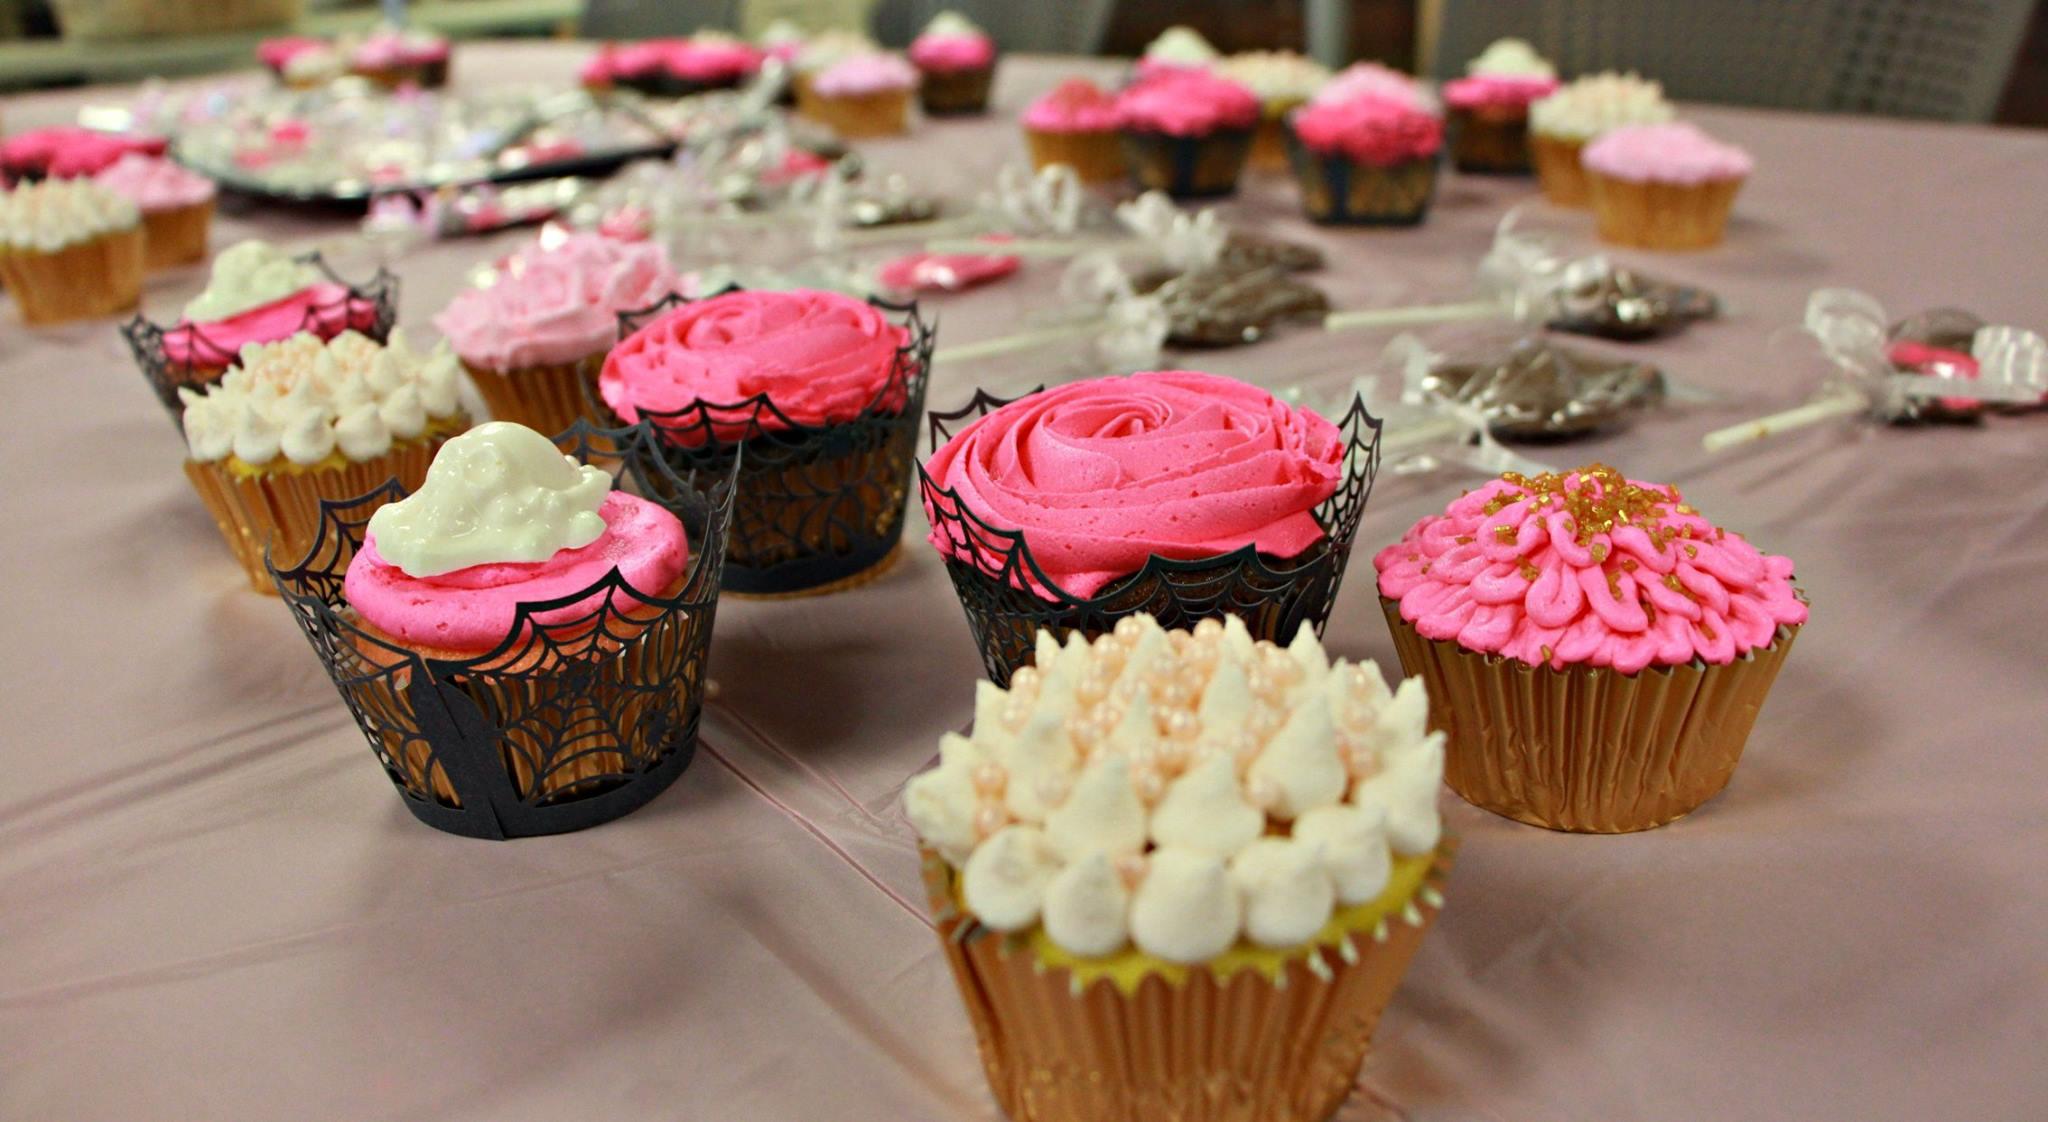 Cupcakes I ABG Capital